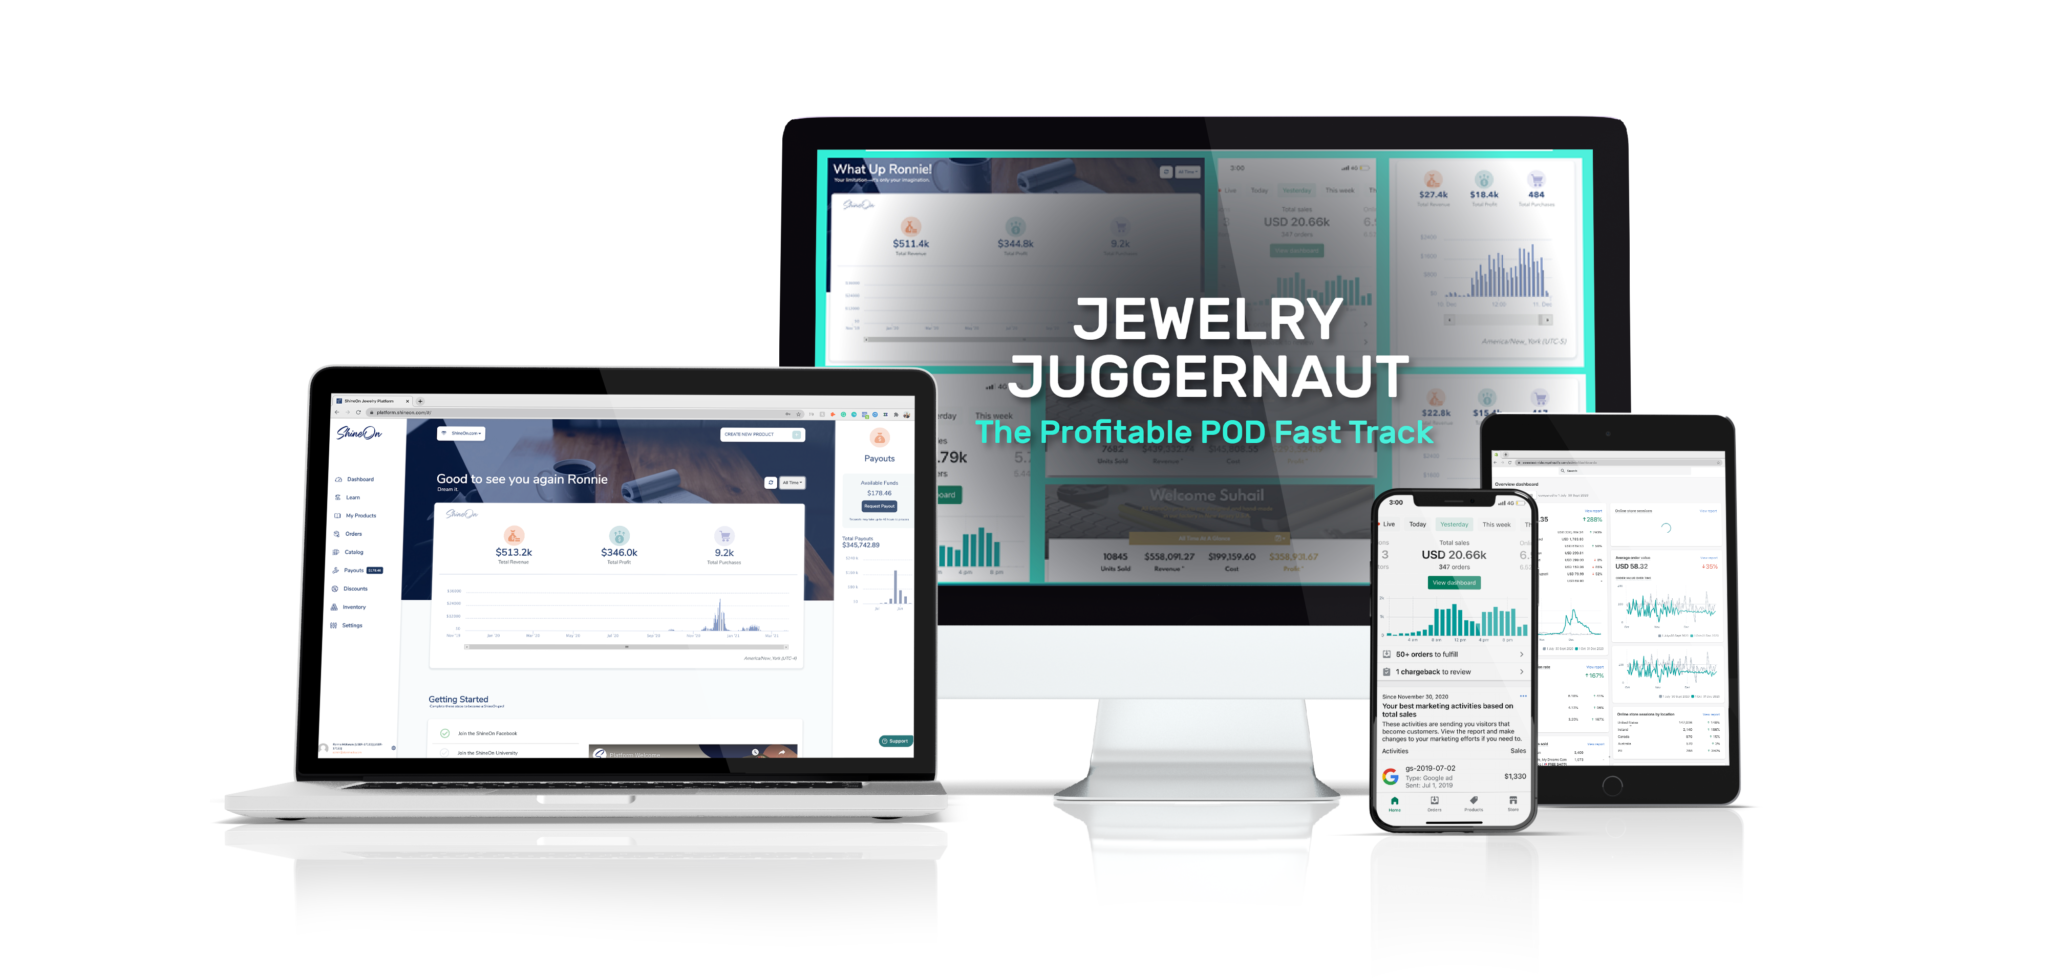 The Jewelry Juggernaut Course